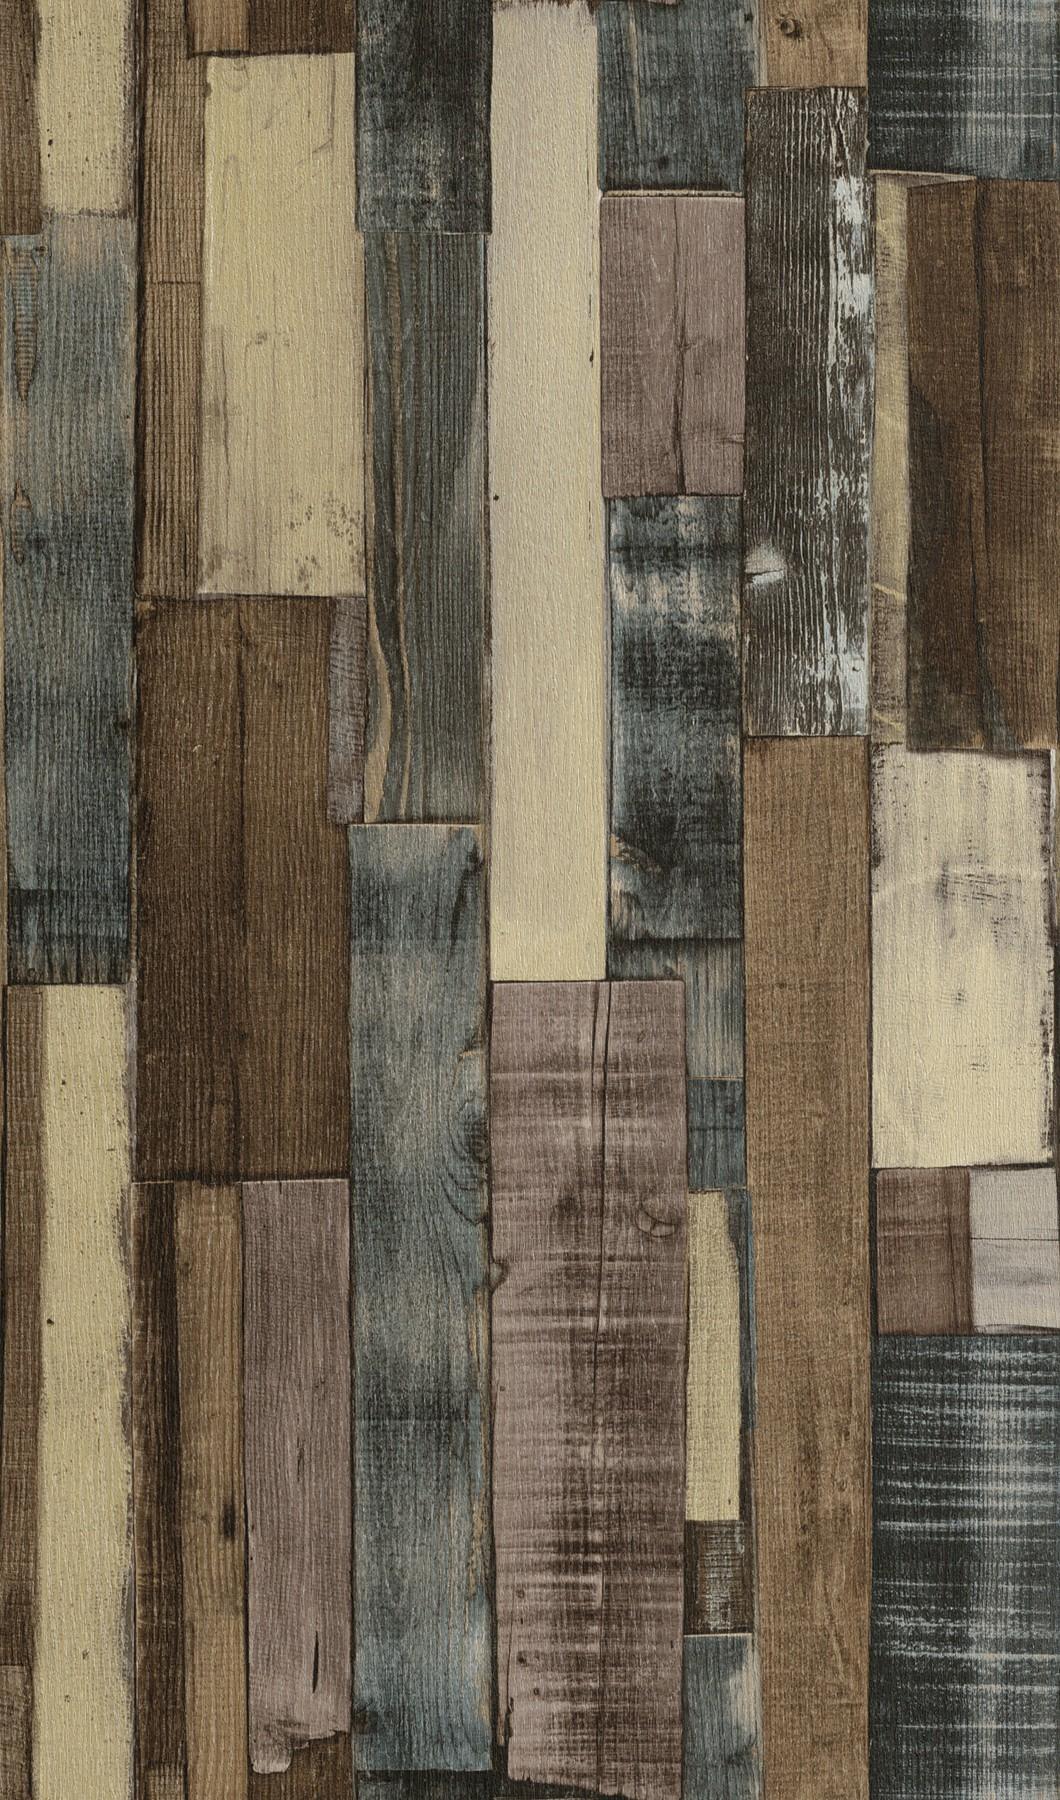 vliestapete factory 2 rasch tapeten 446760 holzoptik patina grau braun beige. Black Bedroom Furniture Sets. Home Design Ideas